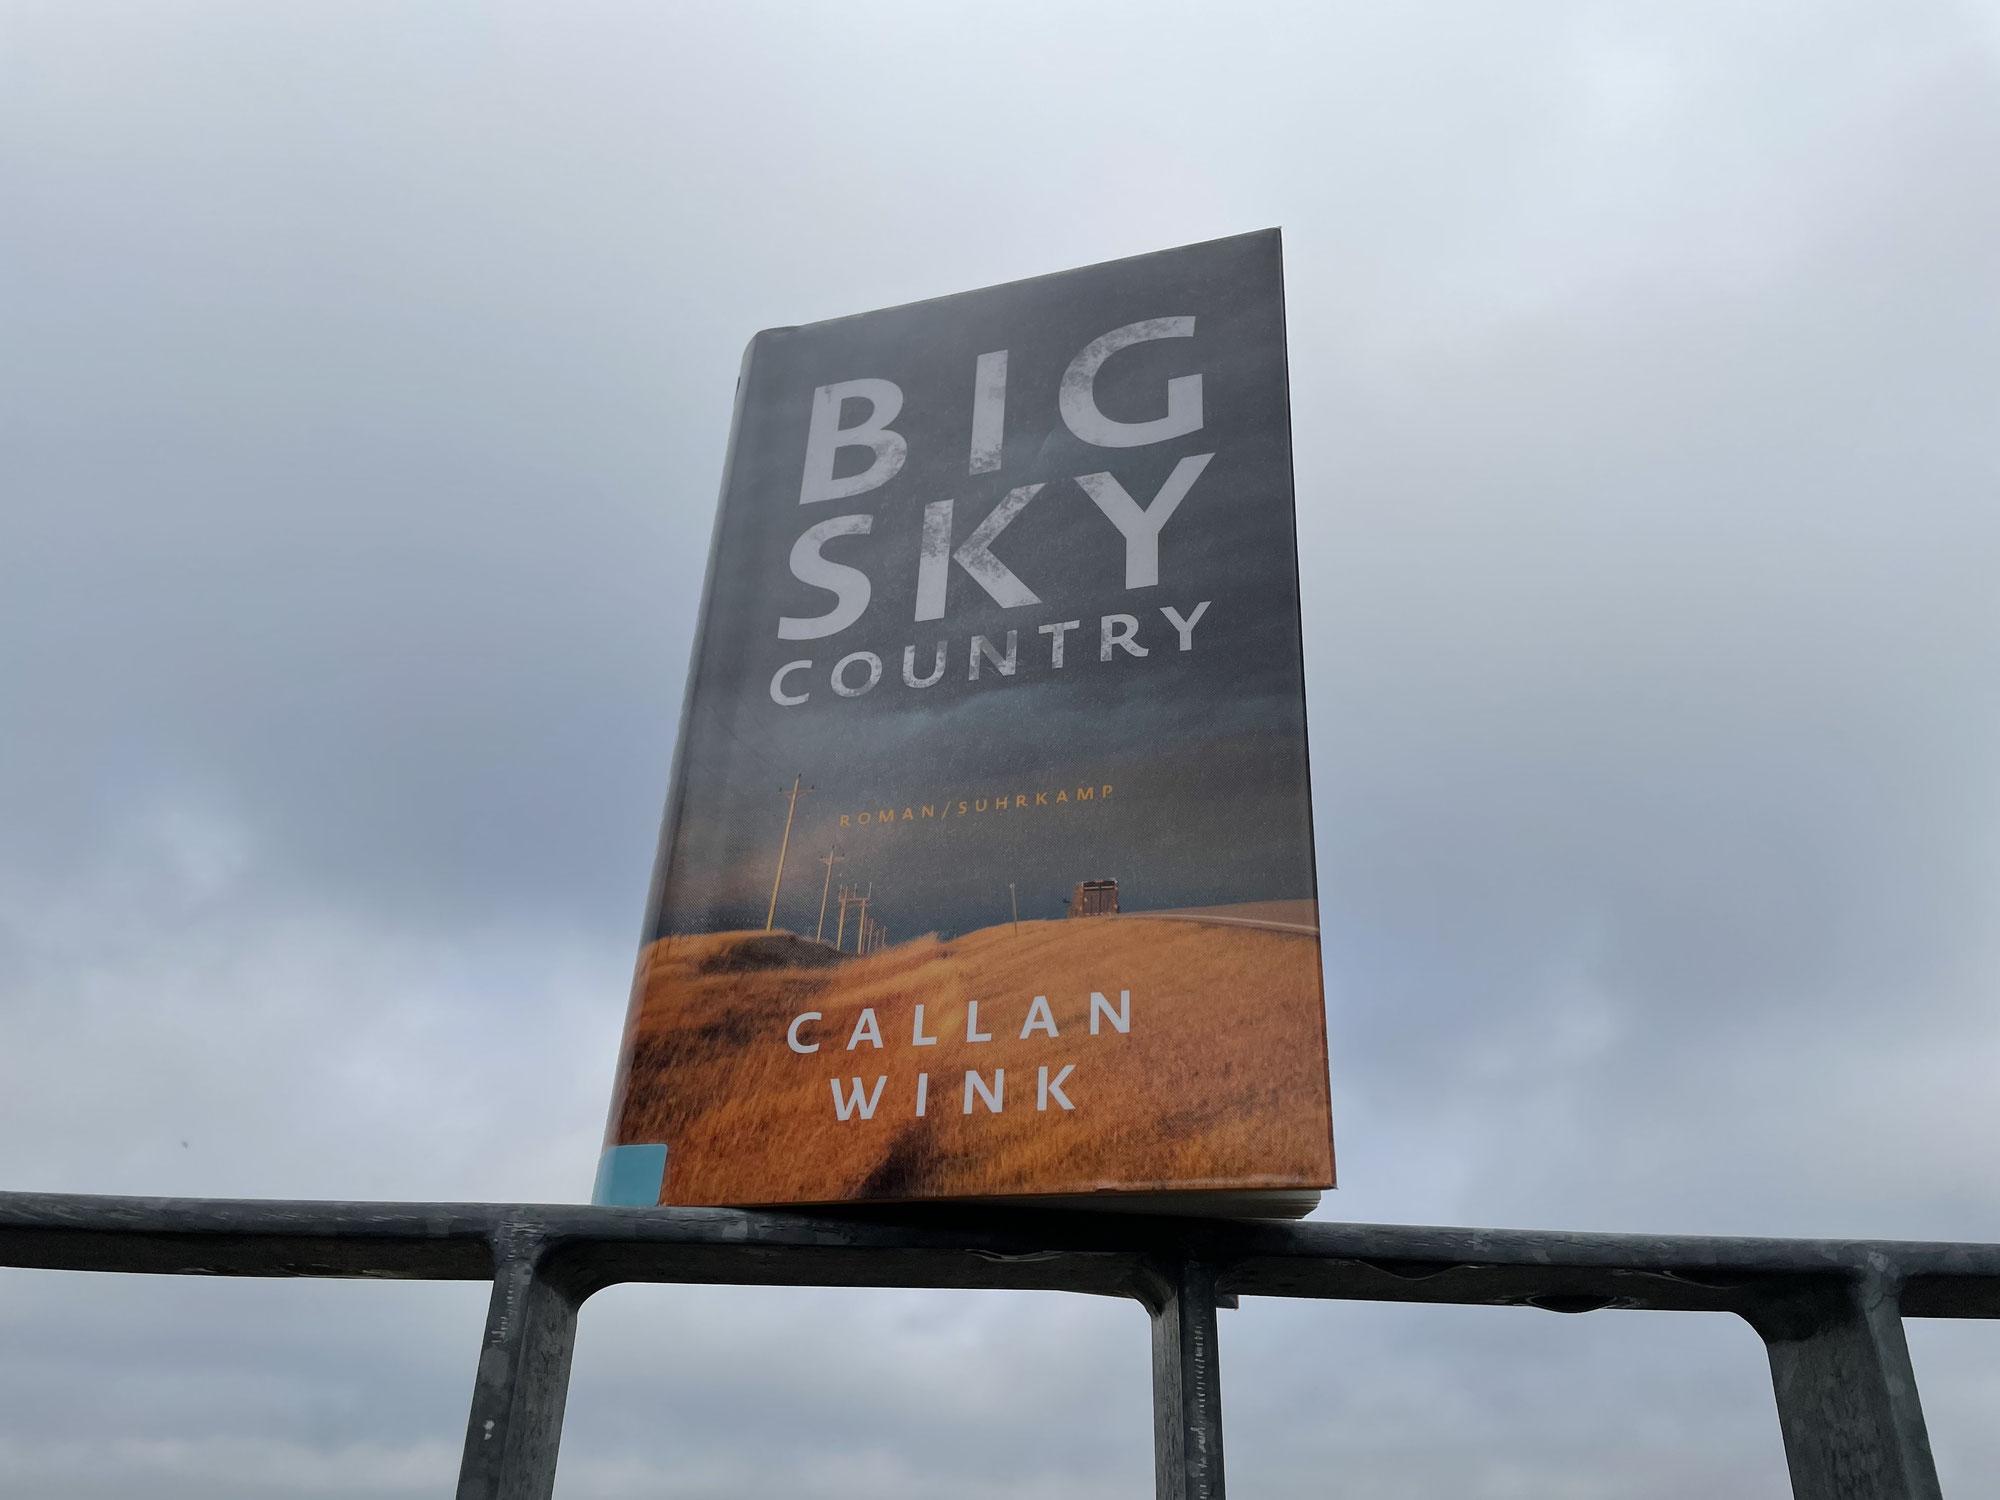 Callan Wink: Big Sky Country (2021) / August (2020)